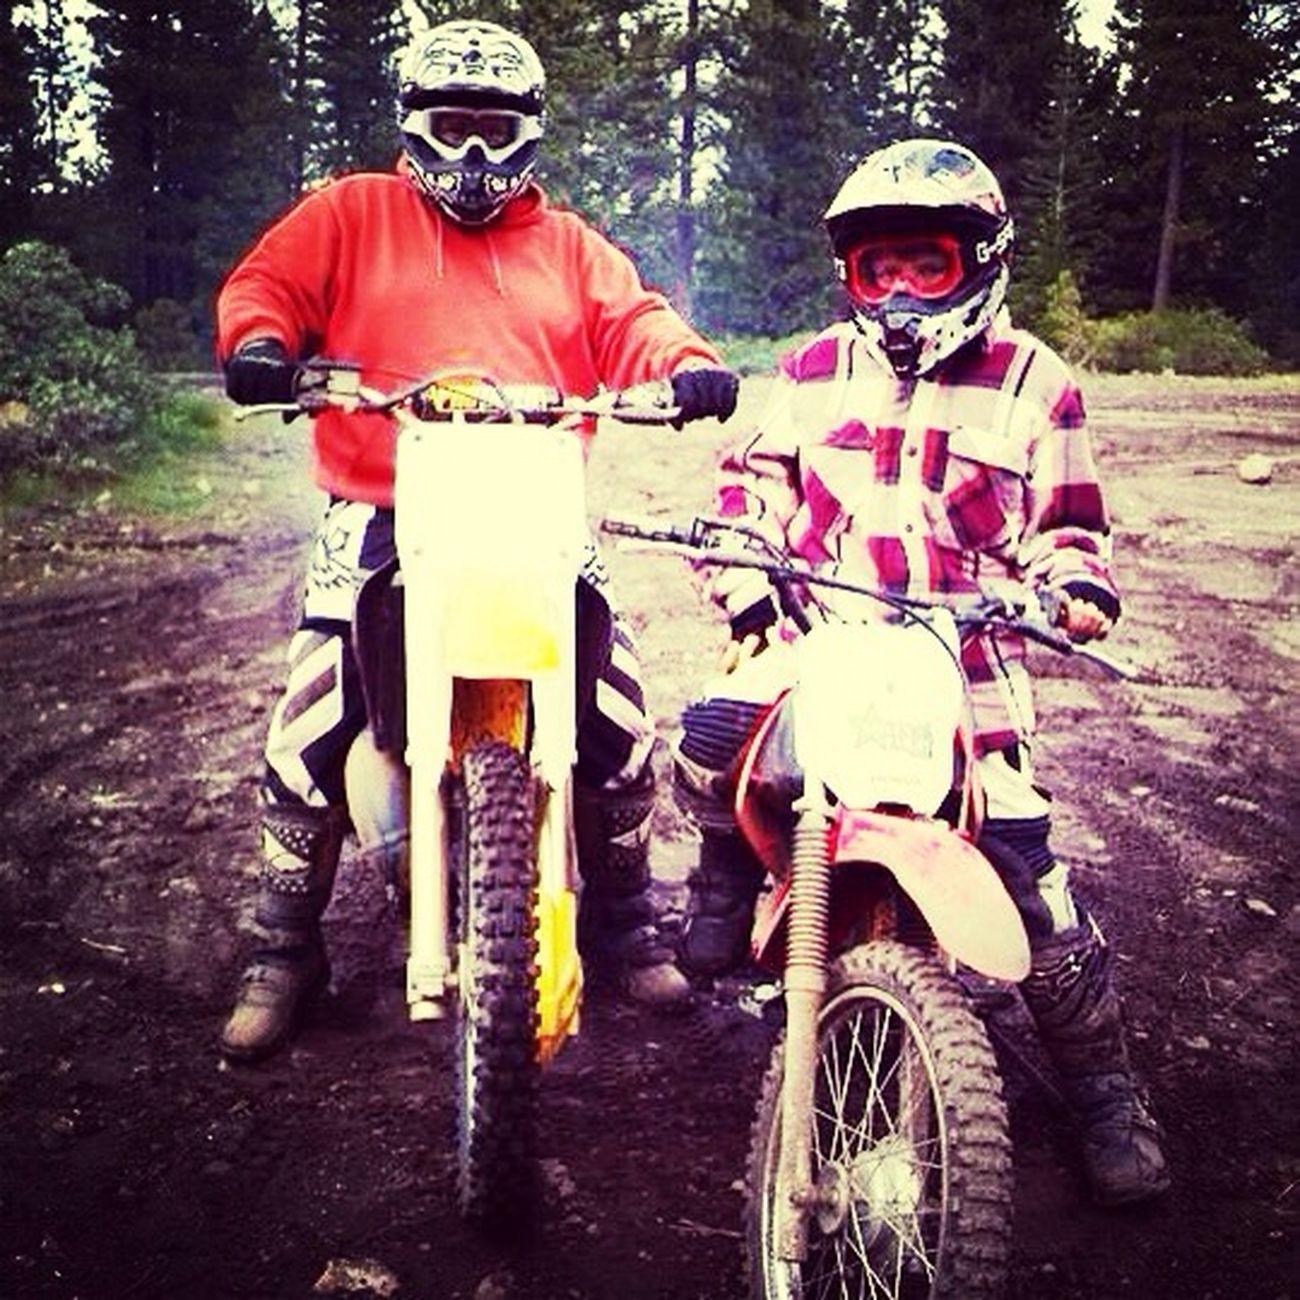 MyBoys Motocross Country Life Wecountry